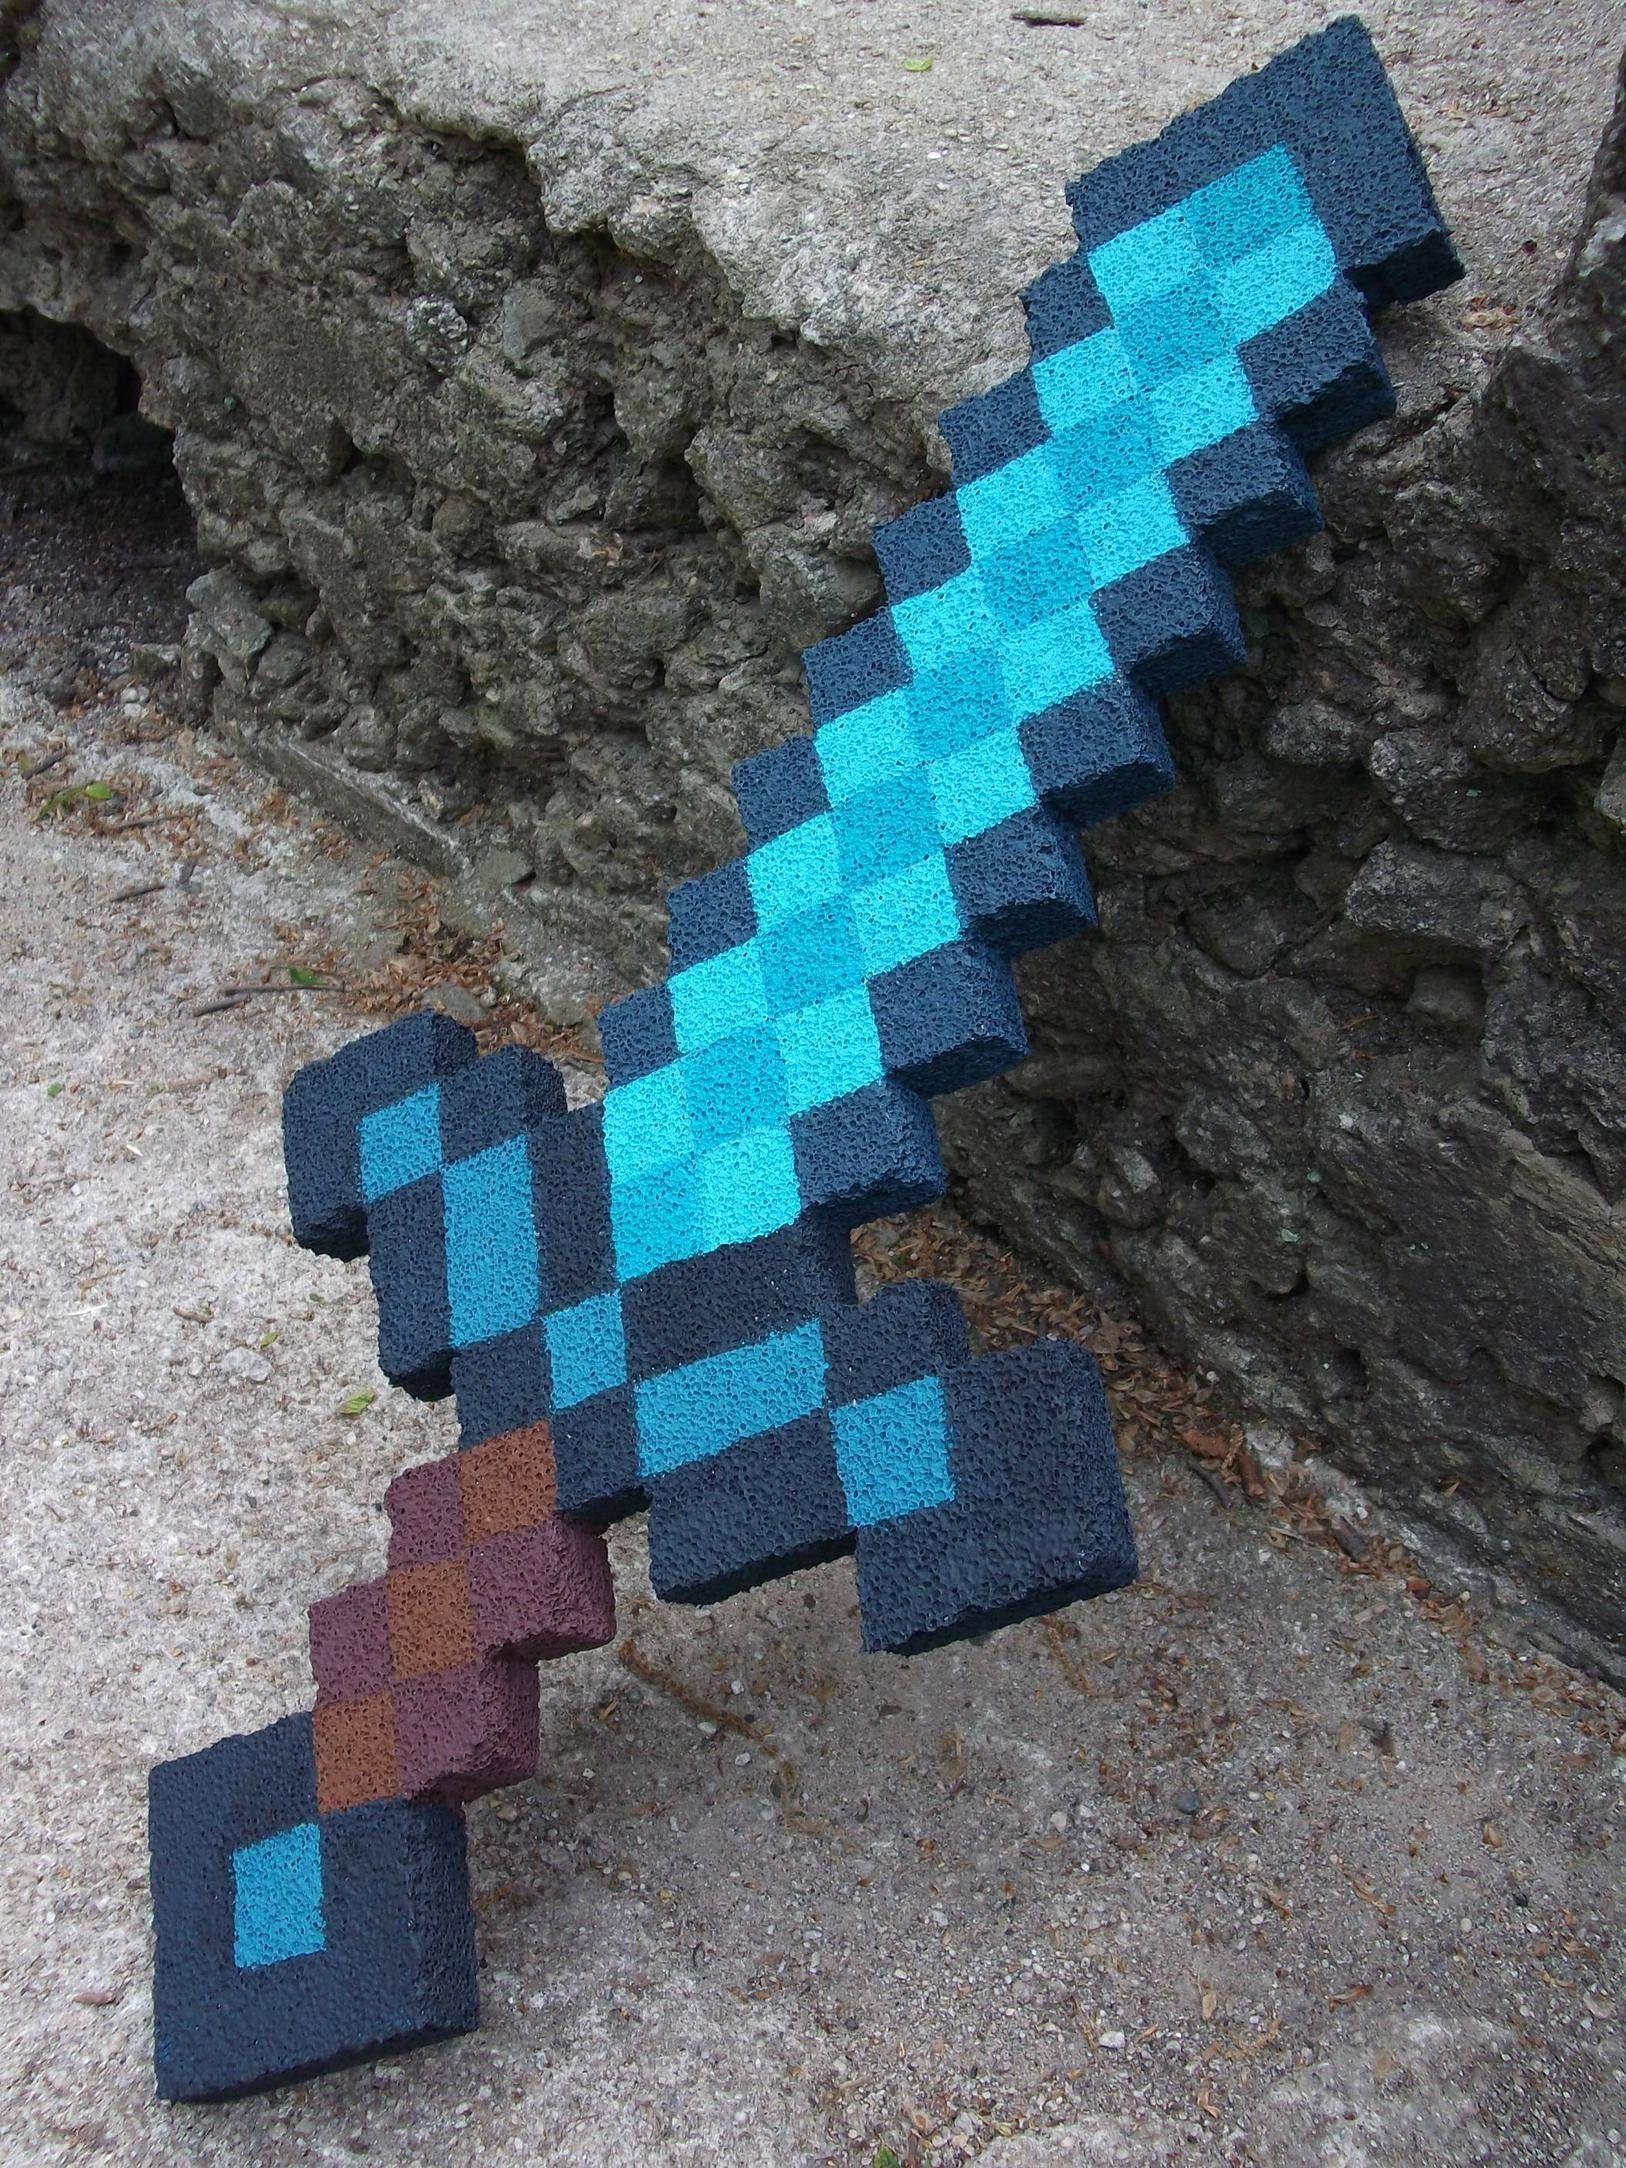 312622 Minecraft Minecraft Jpg 1626 2168 Minecraft Sword Minecraft Diamond Sword Minecraft